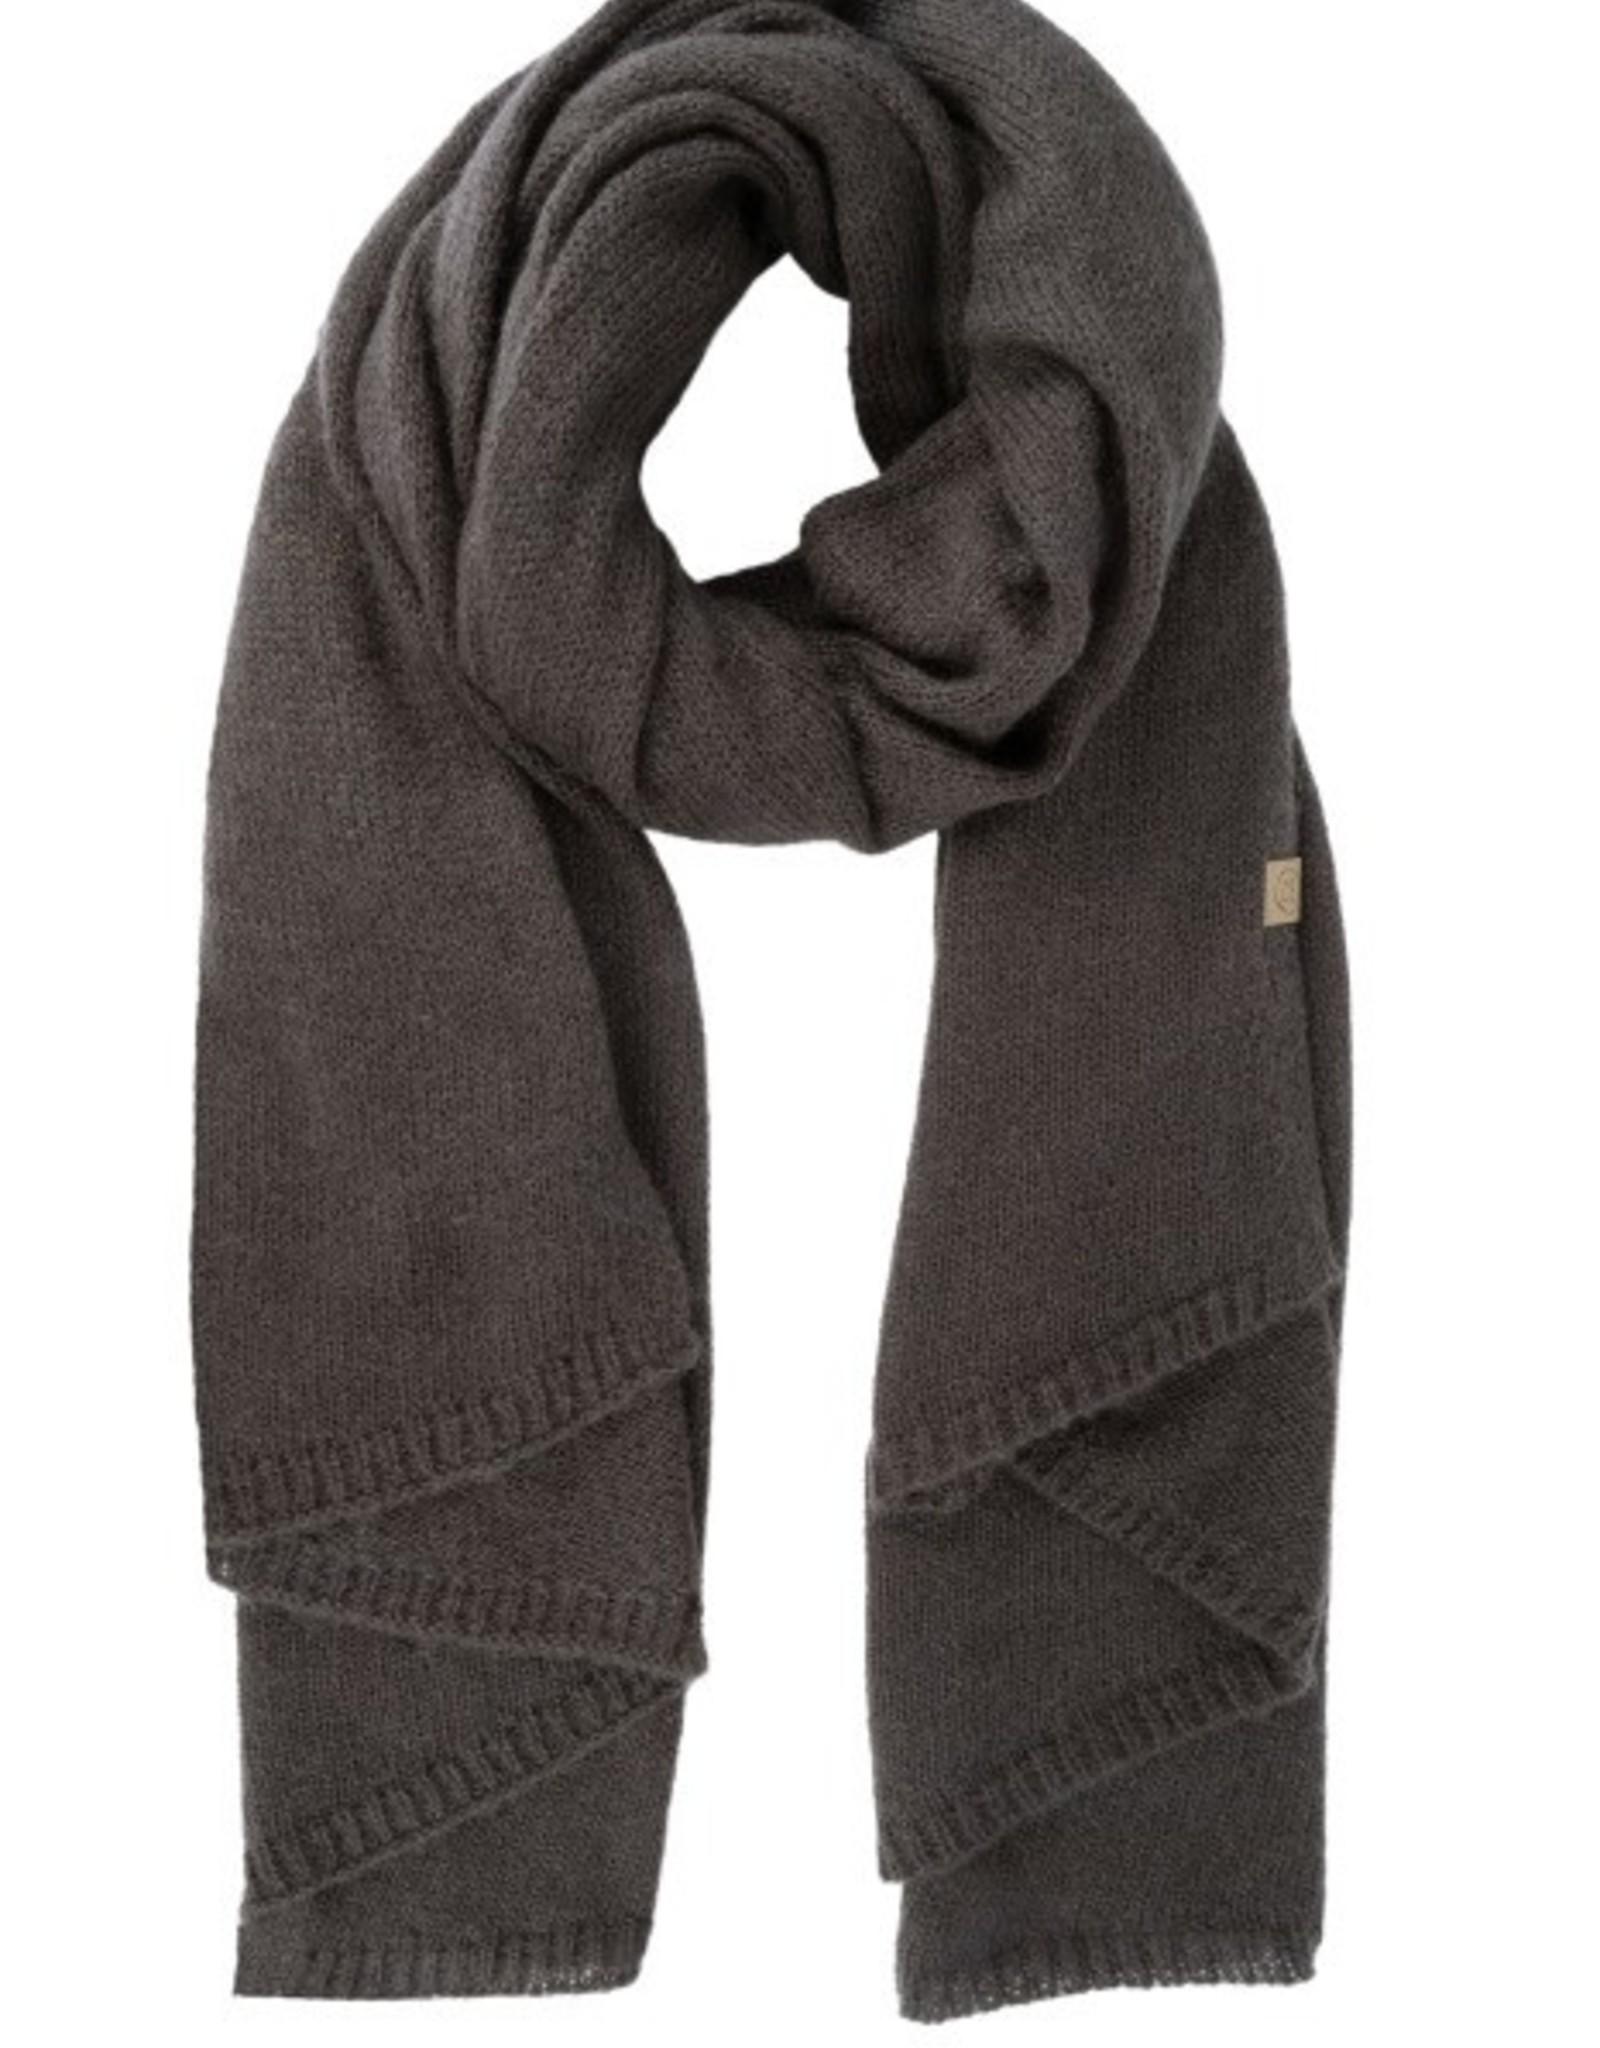 Zusss Zusss - Warme brei sjaal - Grafiet